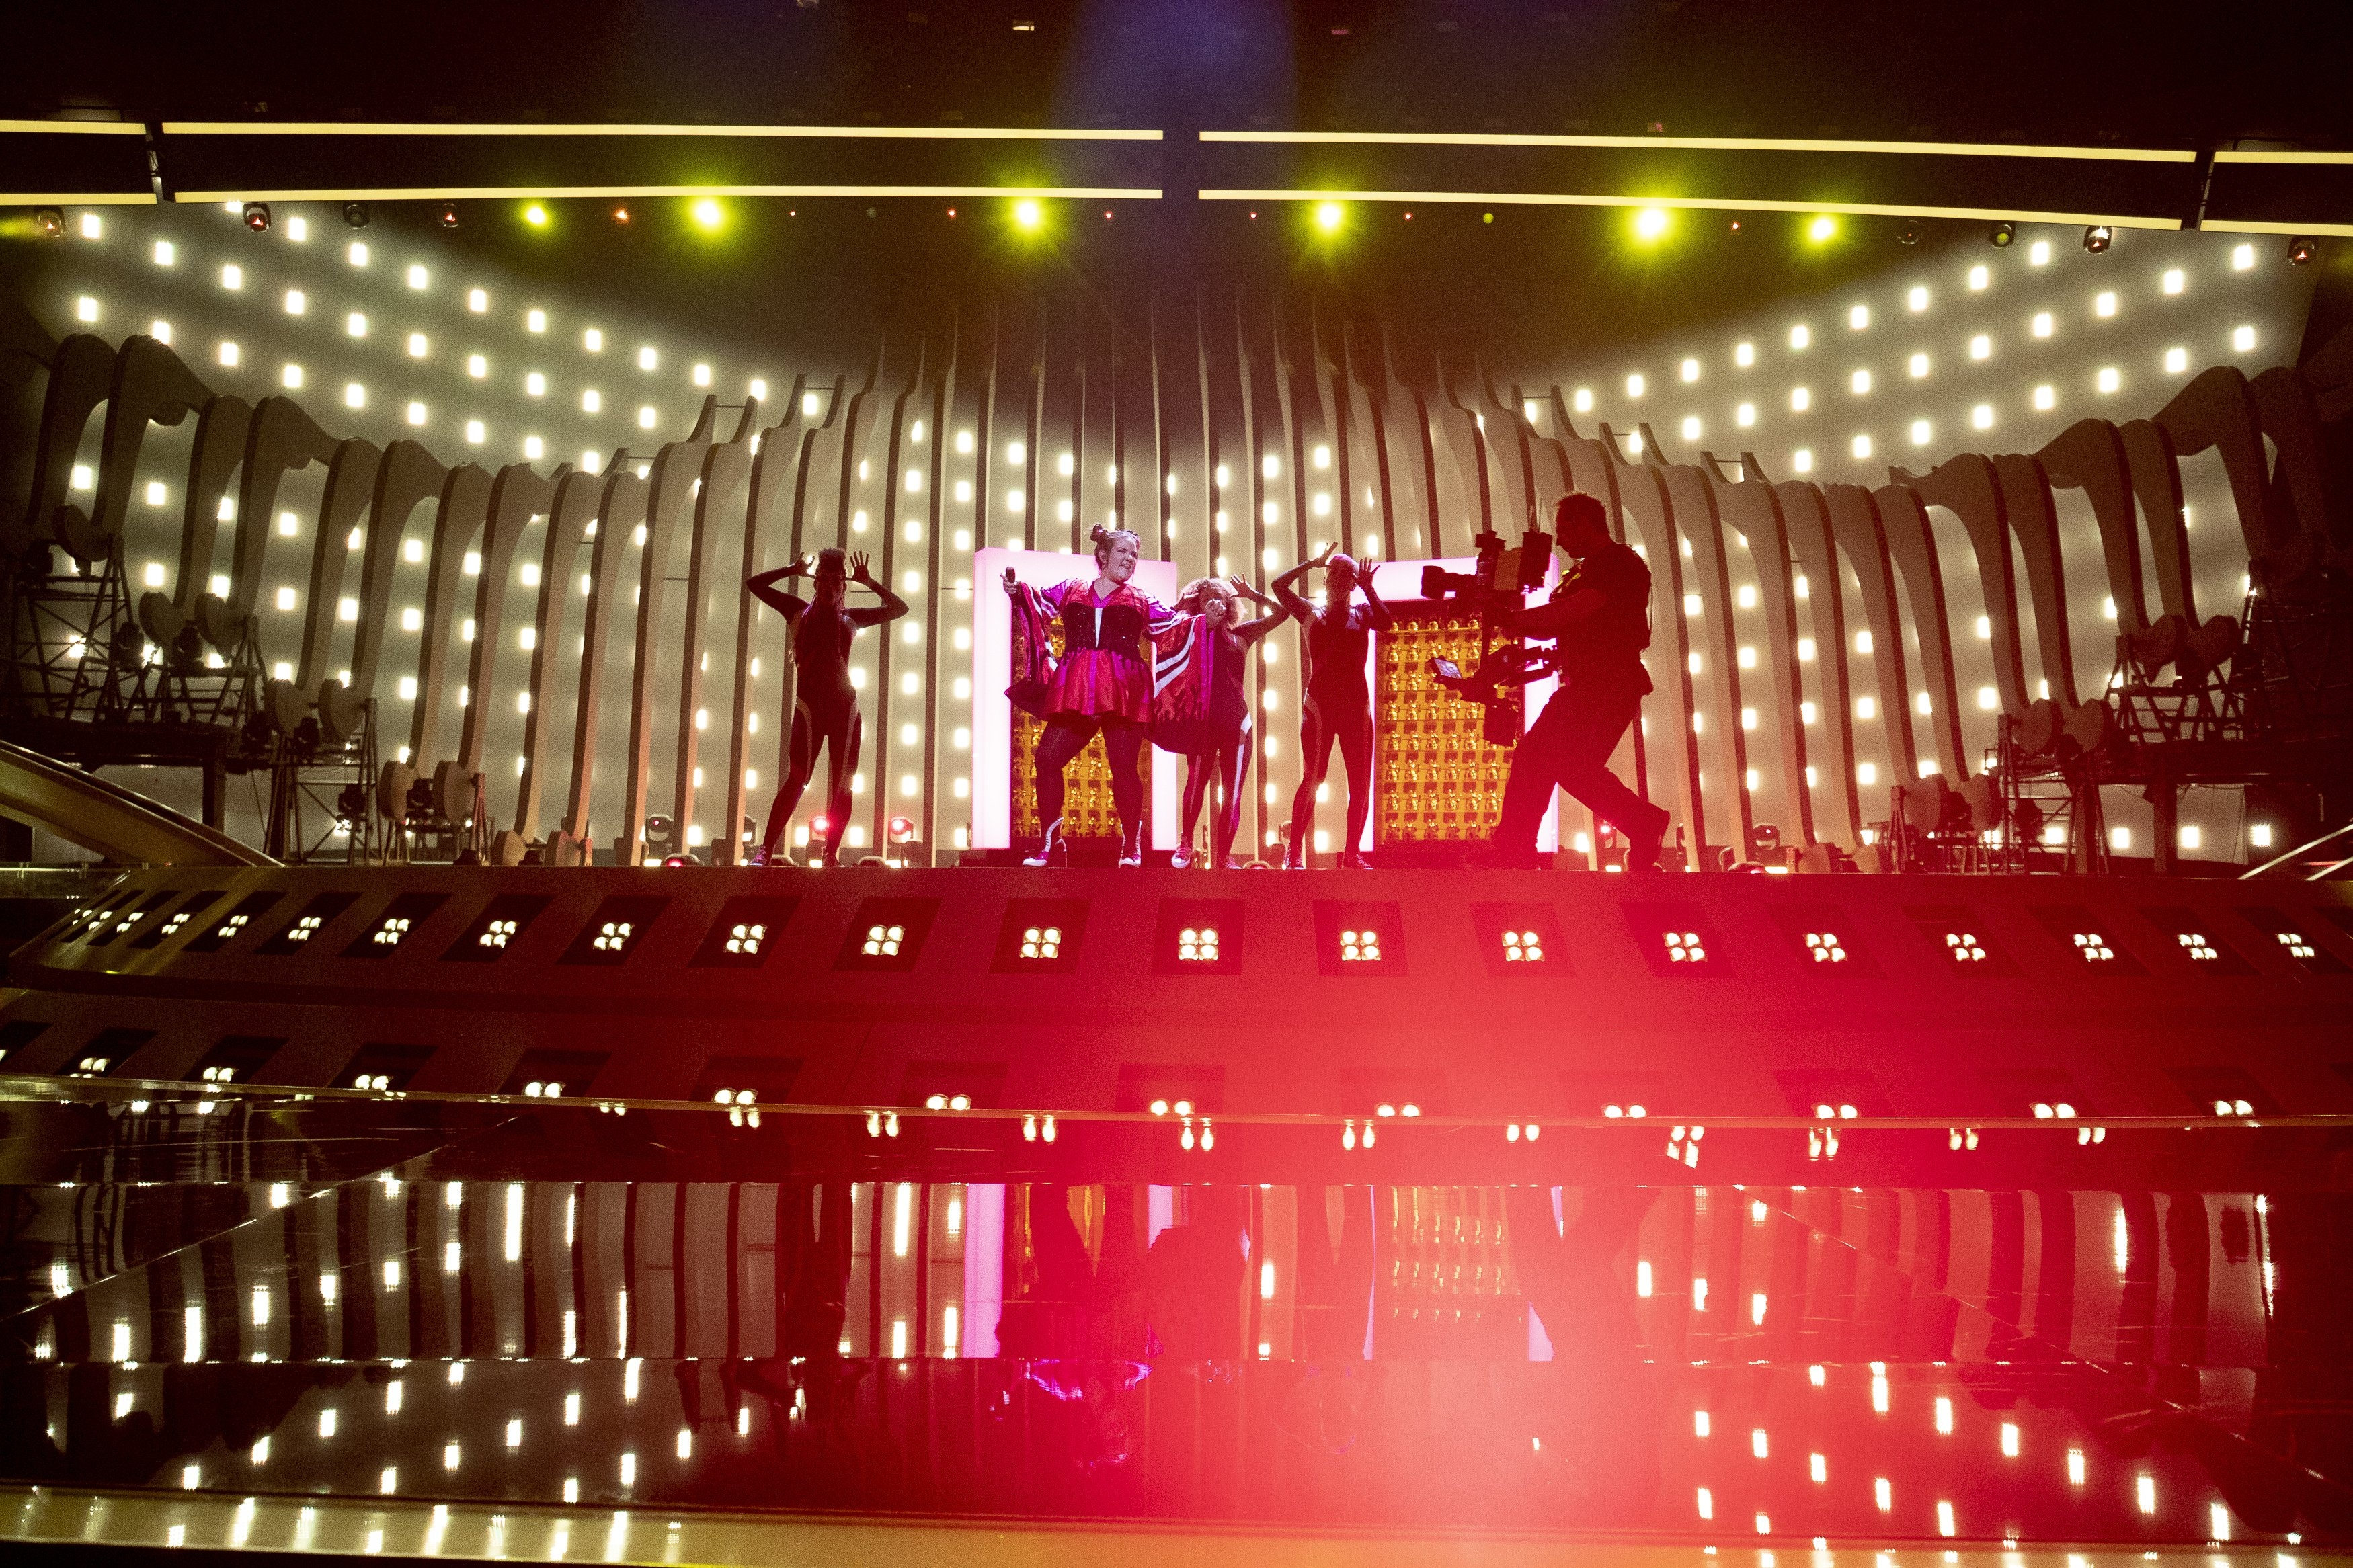 Eurovision Calendar Of Events: 2019 - Eurovoix Maroon 5 Calendar 2019